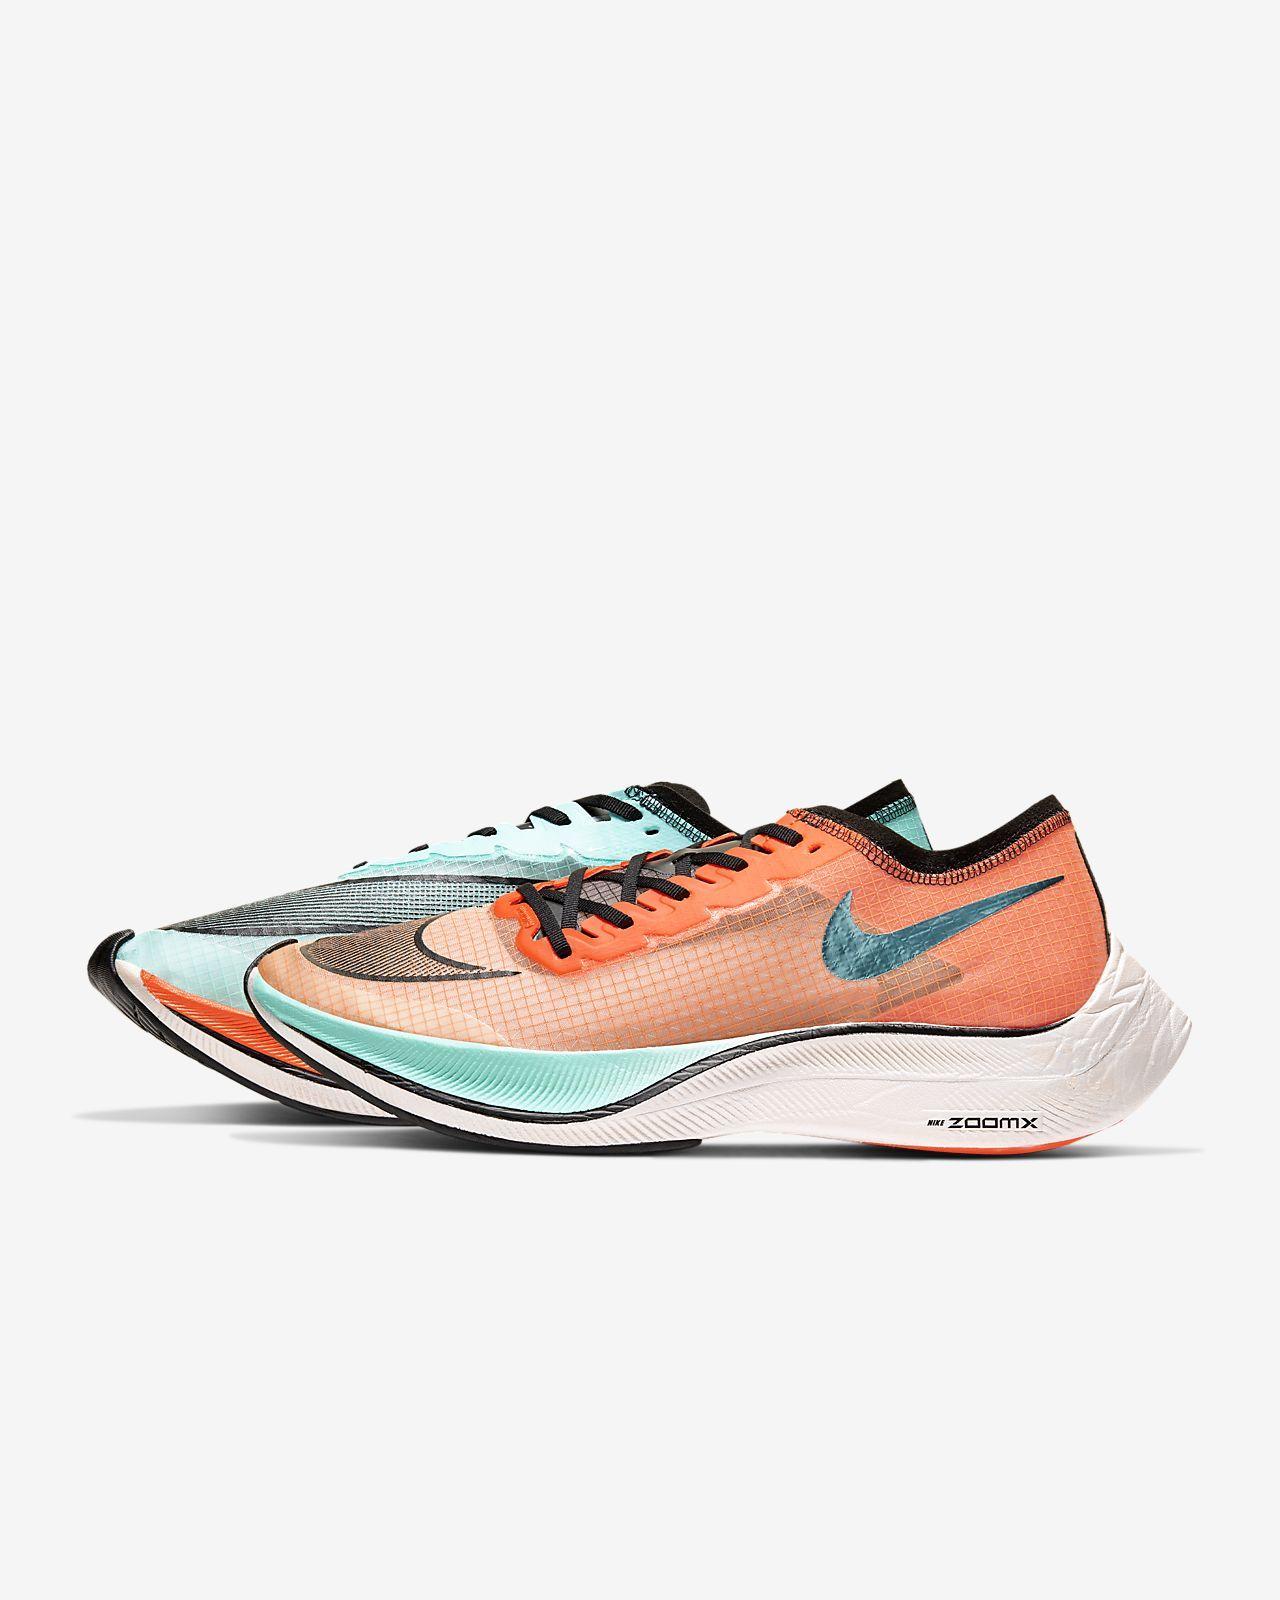 Nike Zoomx Vaporfly Next Running Shoe Nike Com Running Shoes Nike Nike Running